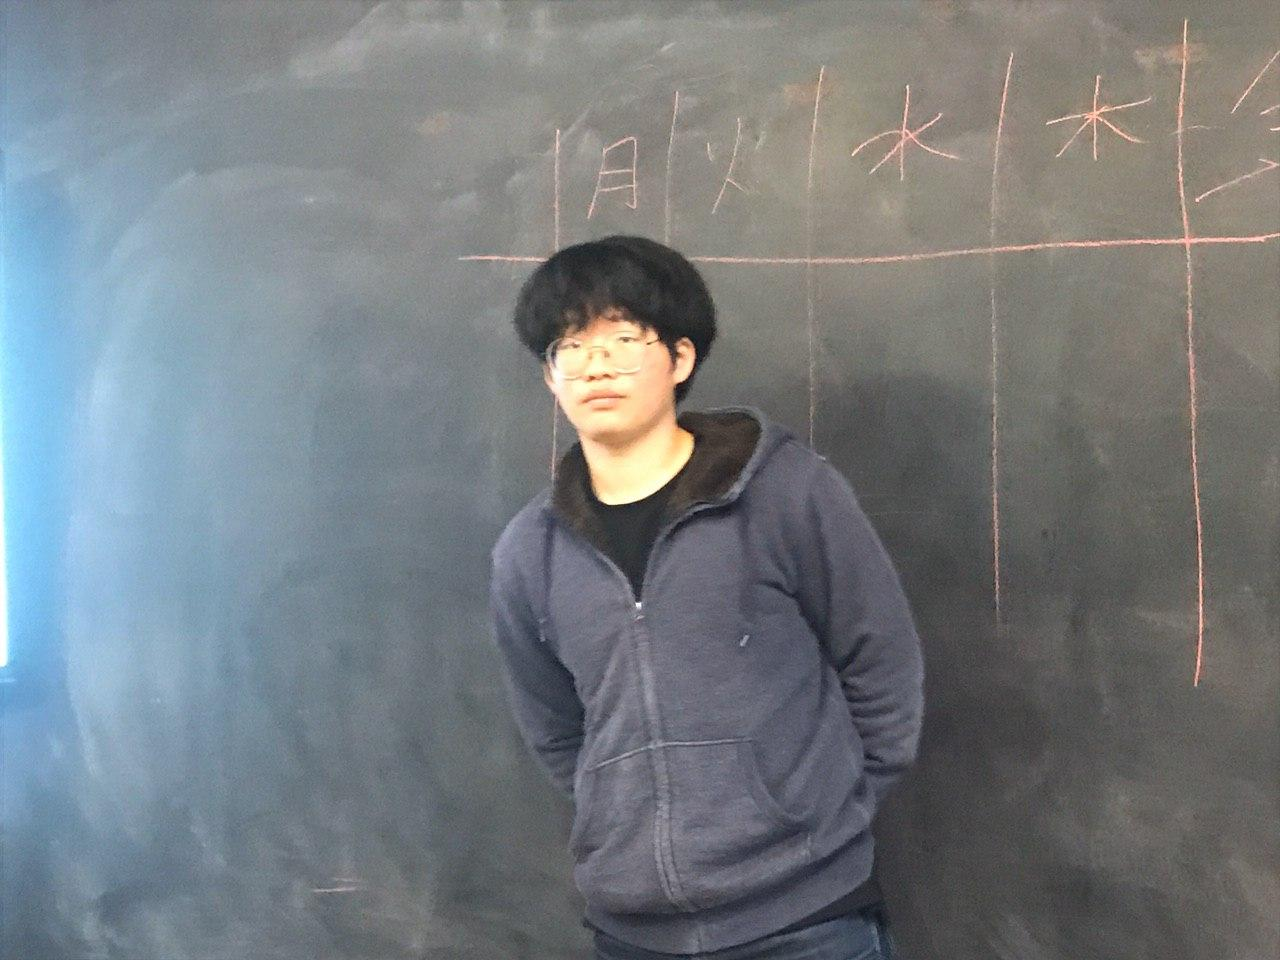 photo_2020-04-29_16-27-46.jpg